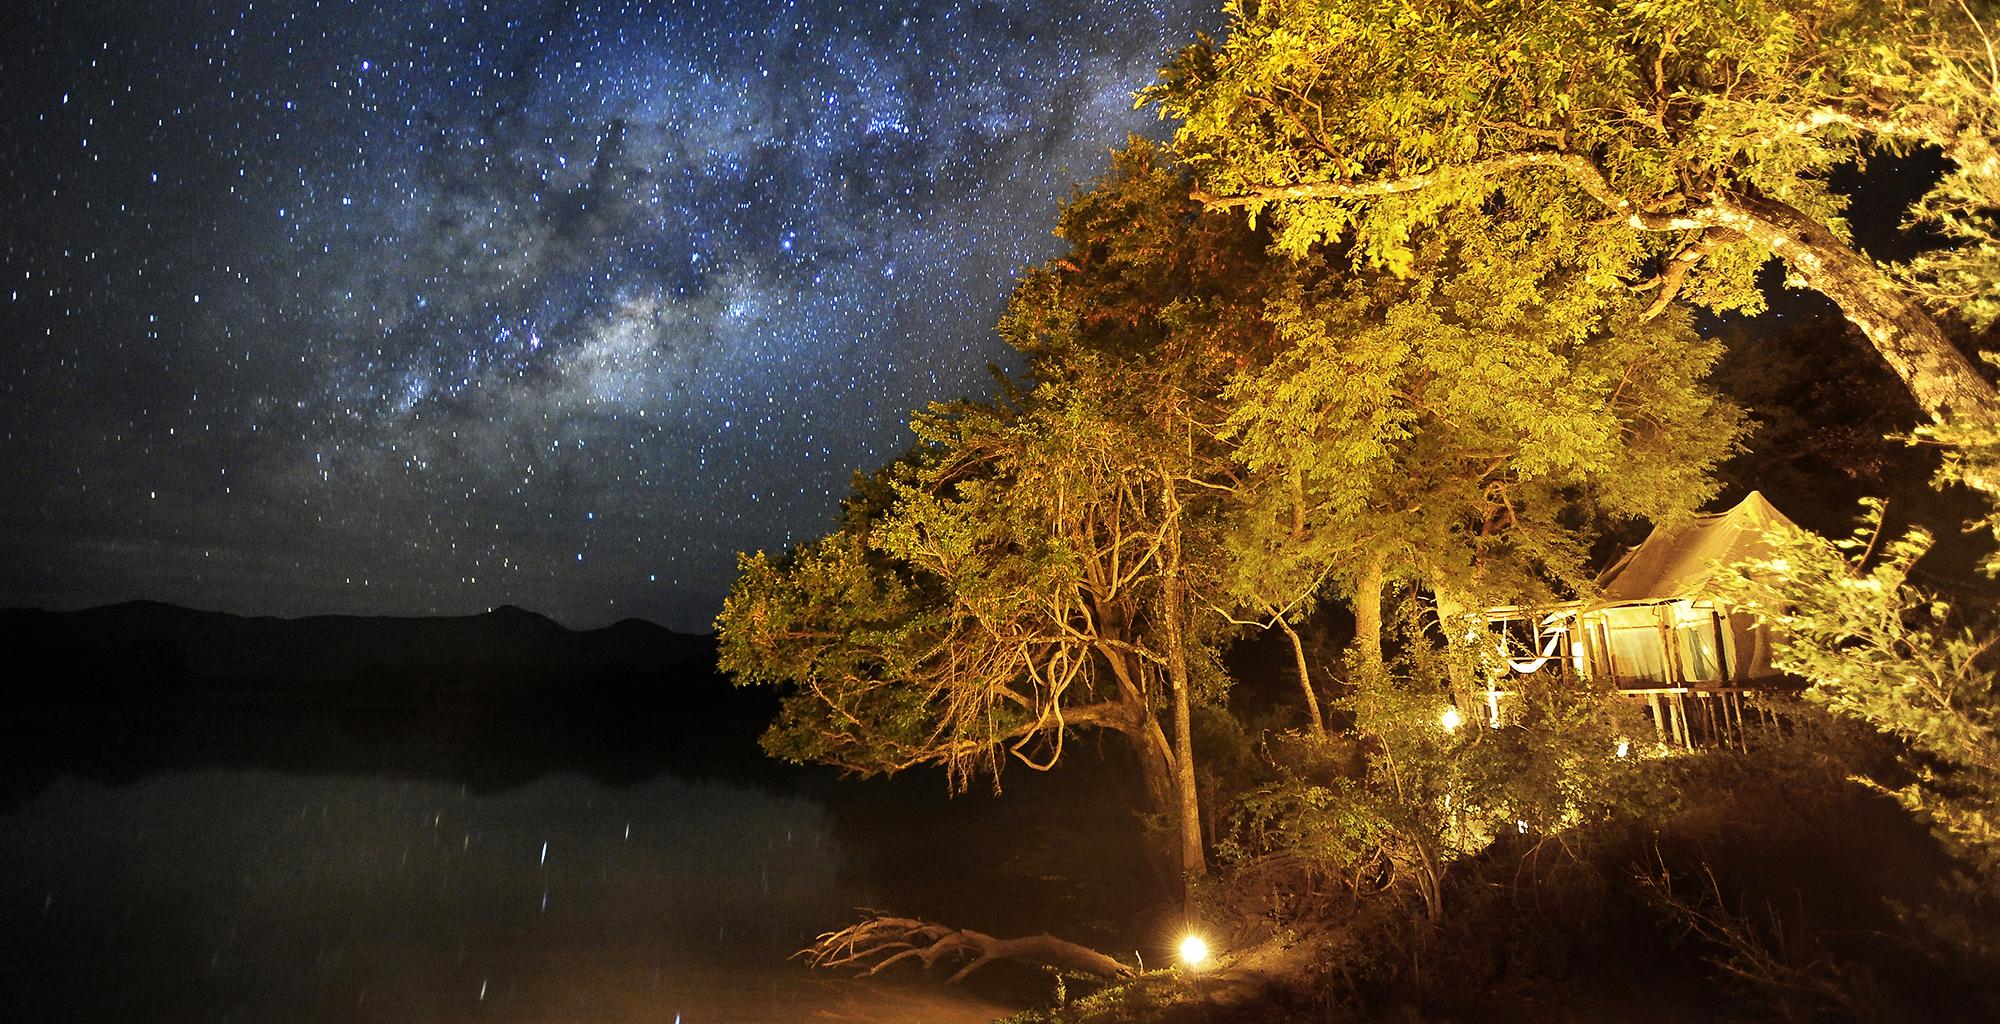 Zambia-Chindeni-Camp-Stars